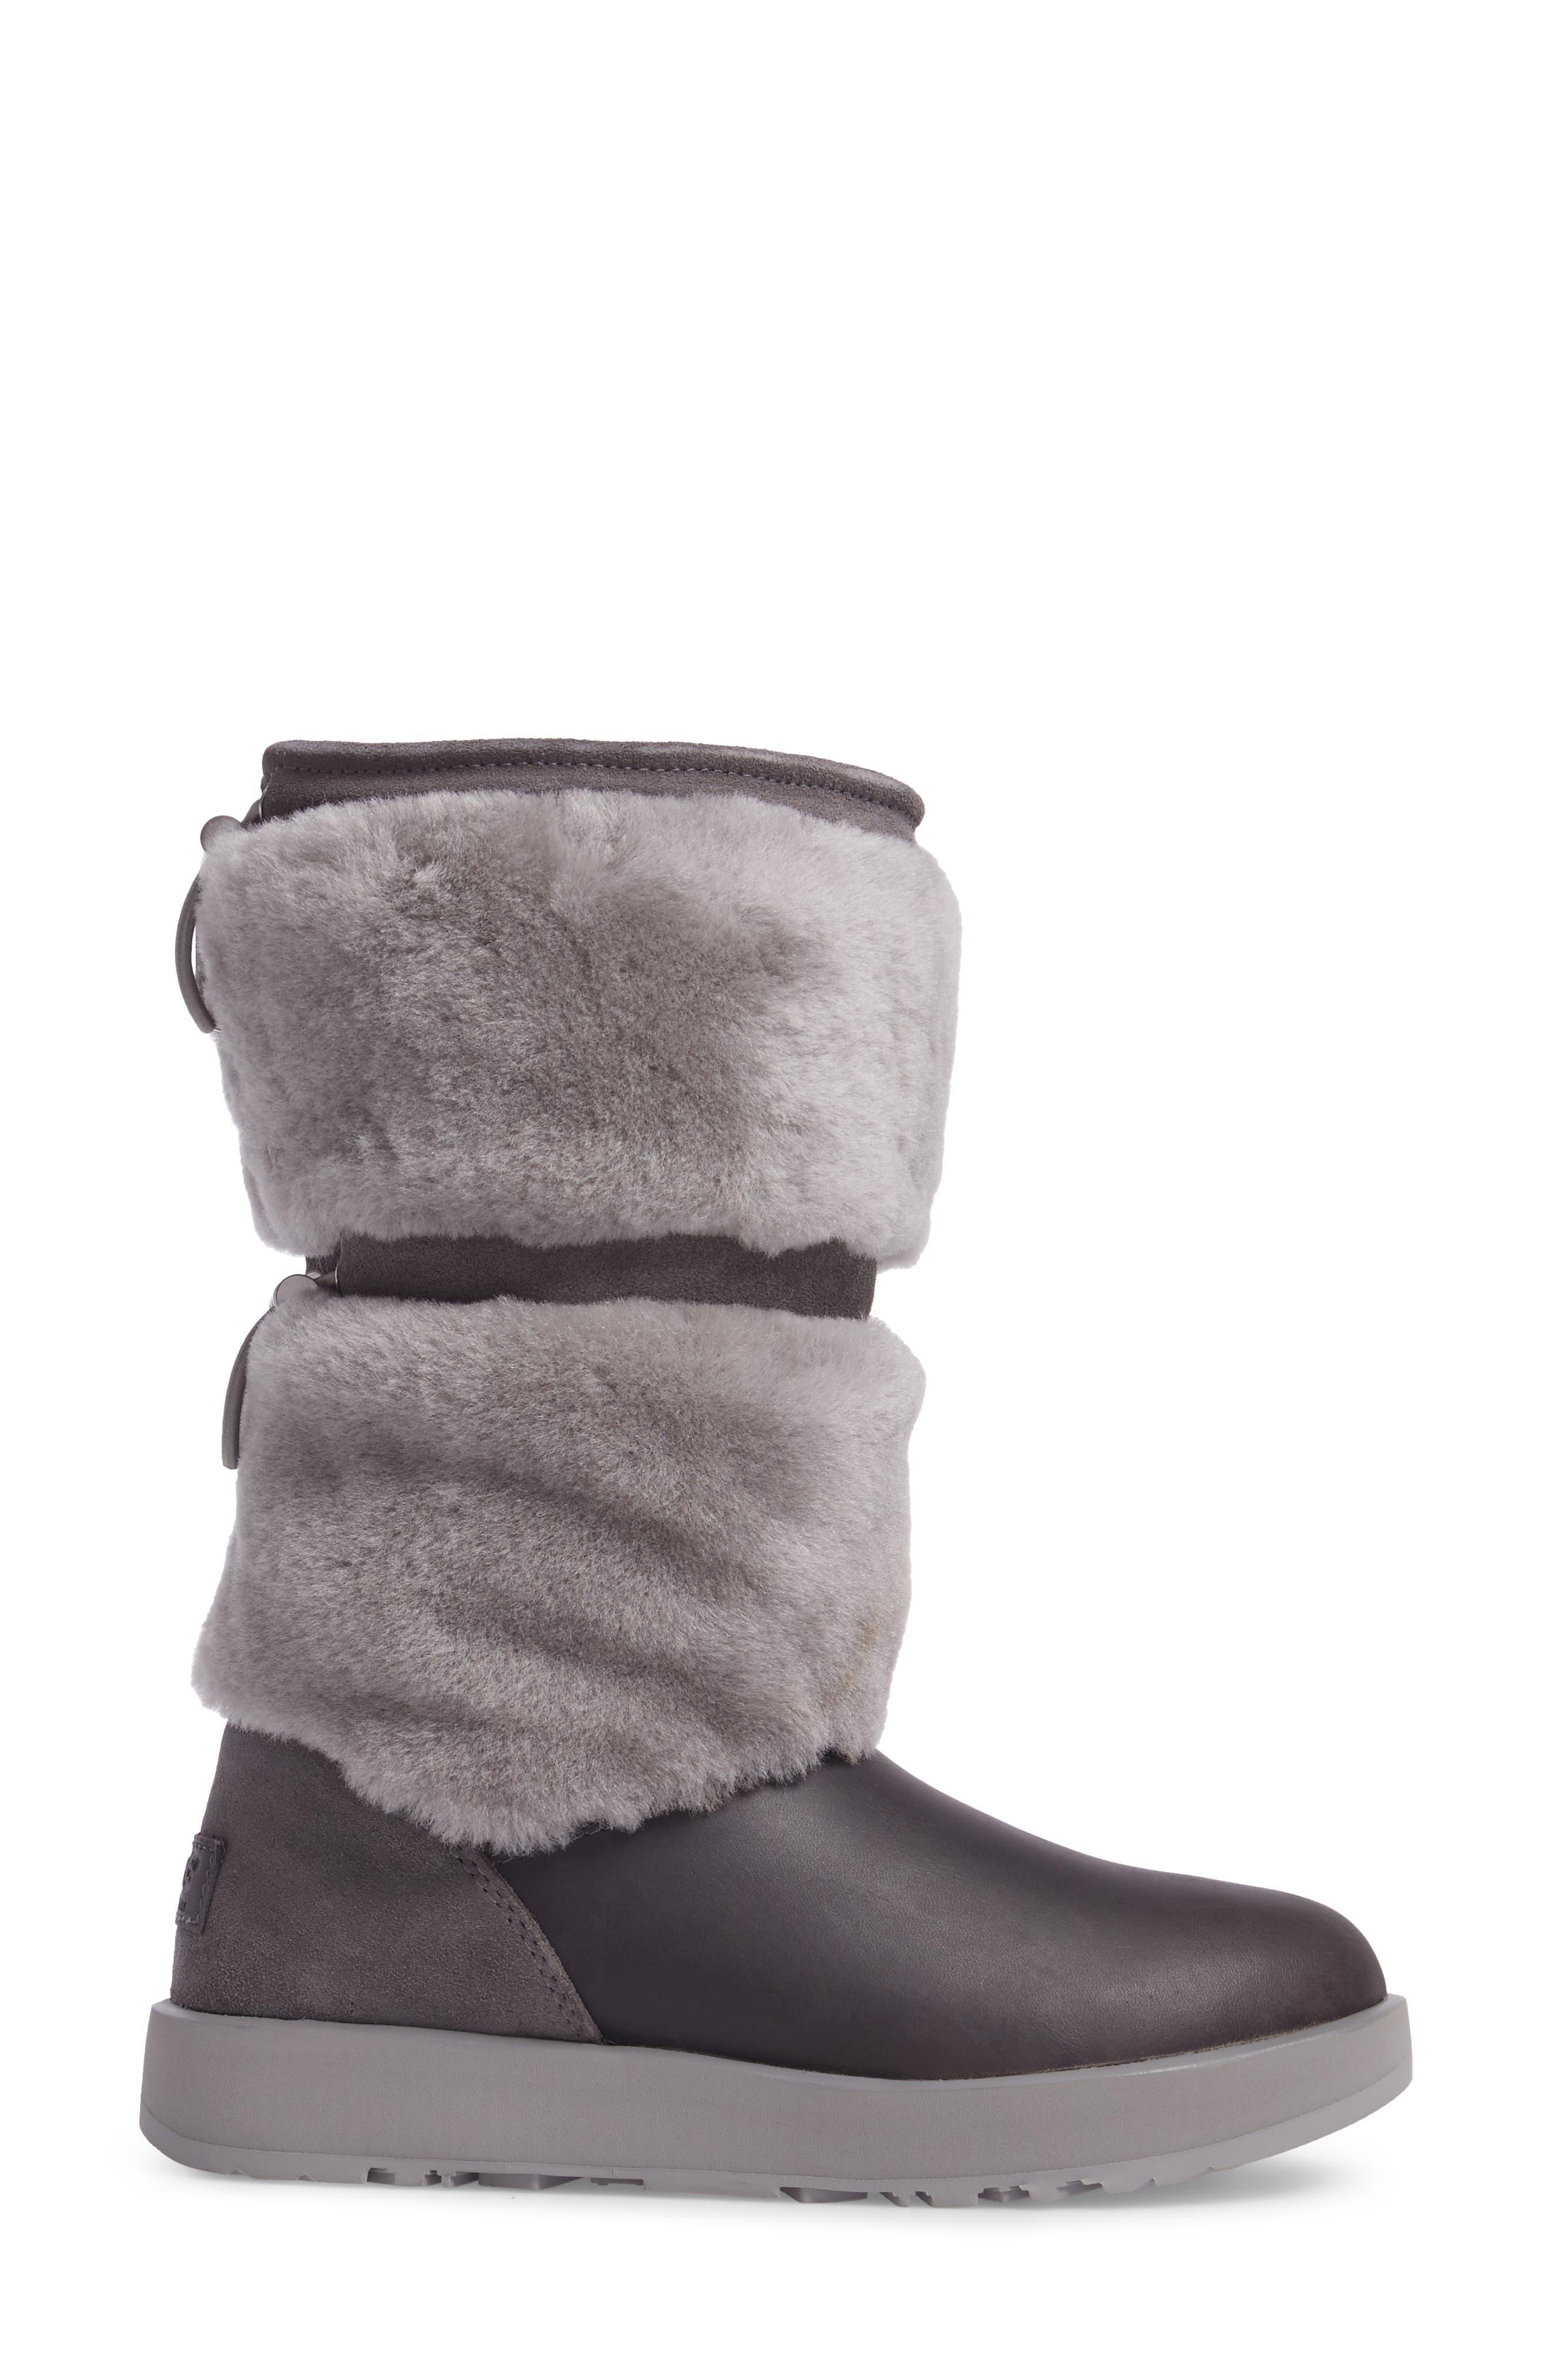 Alternate Image 3  - UGG® Reykir Waterproof Snow Boot (Women)